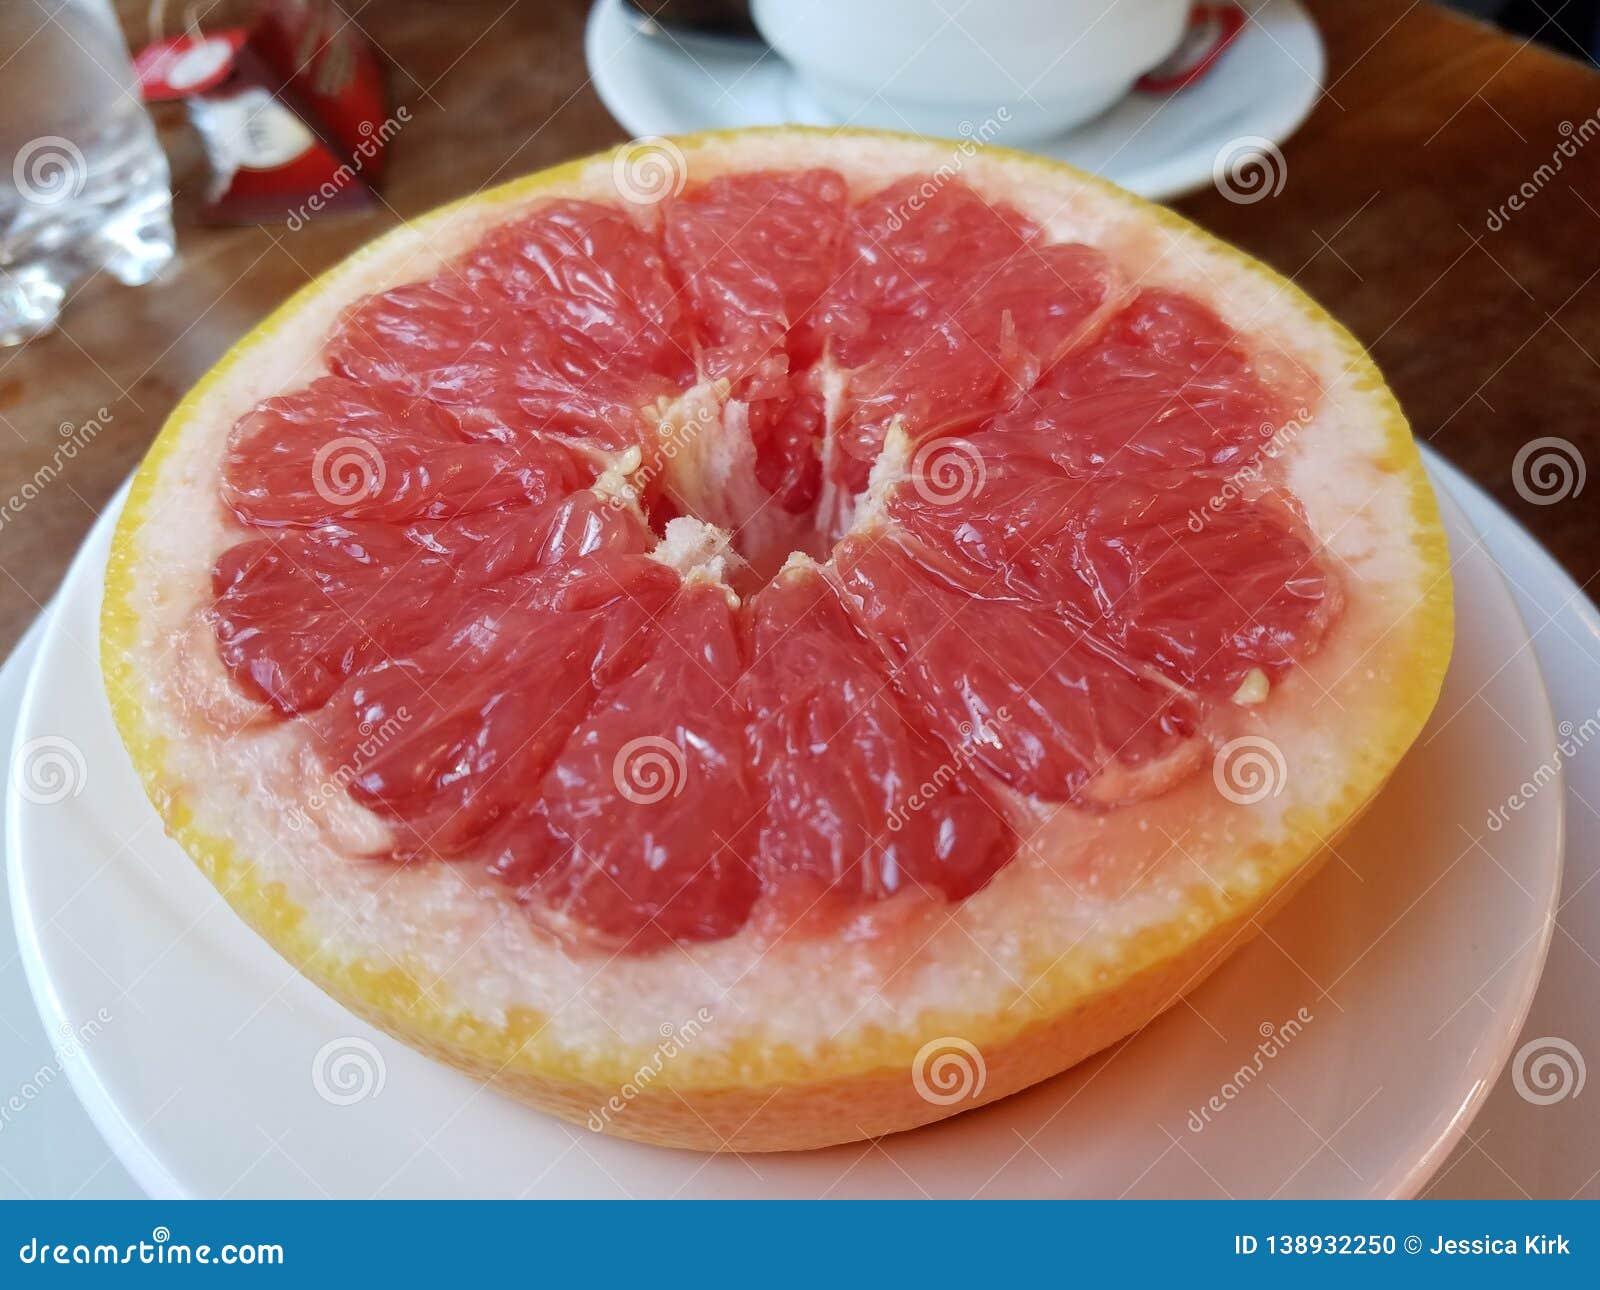 Halved red grapefruit